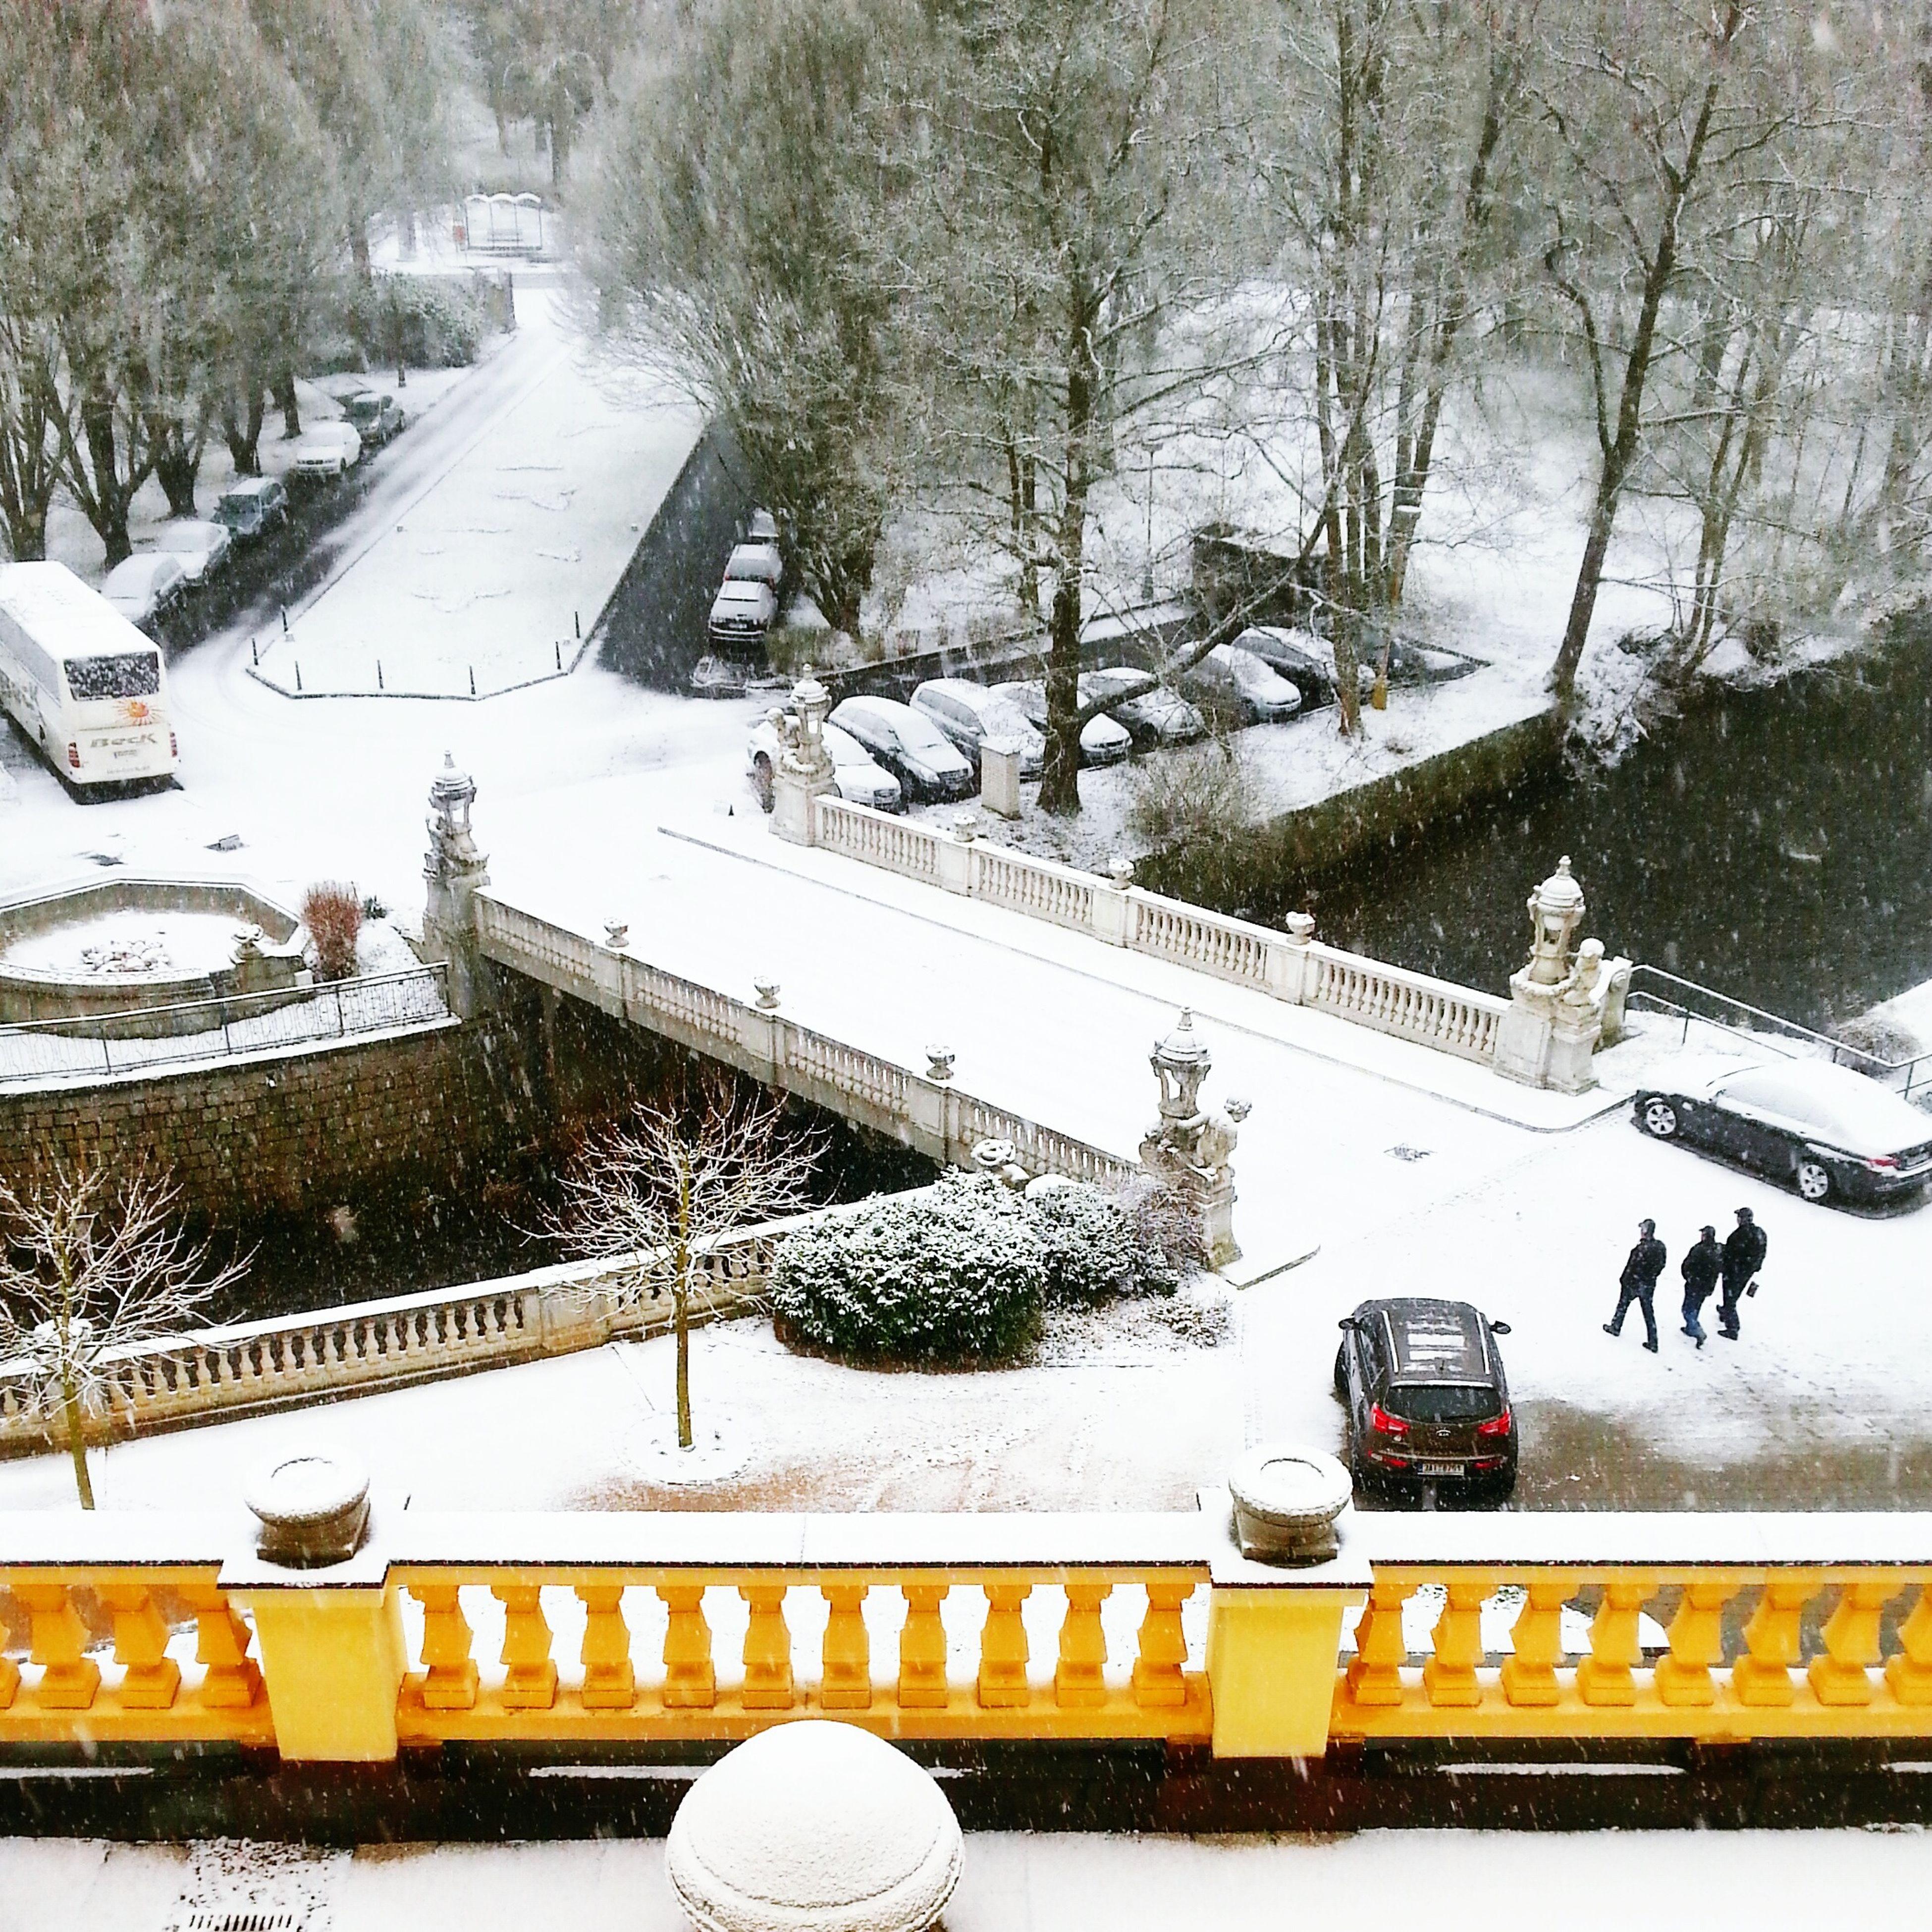 I woke up to this? Wintermornings NothingButSnow Getaway  Inlove EuropeanWinter Karlovyvary Myviewrightnow